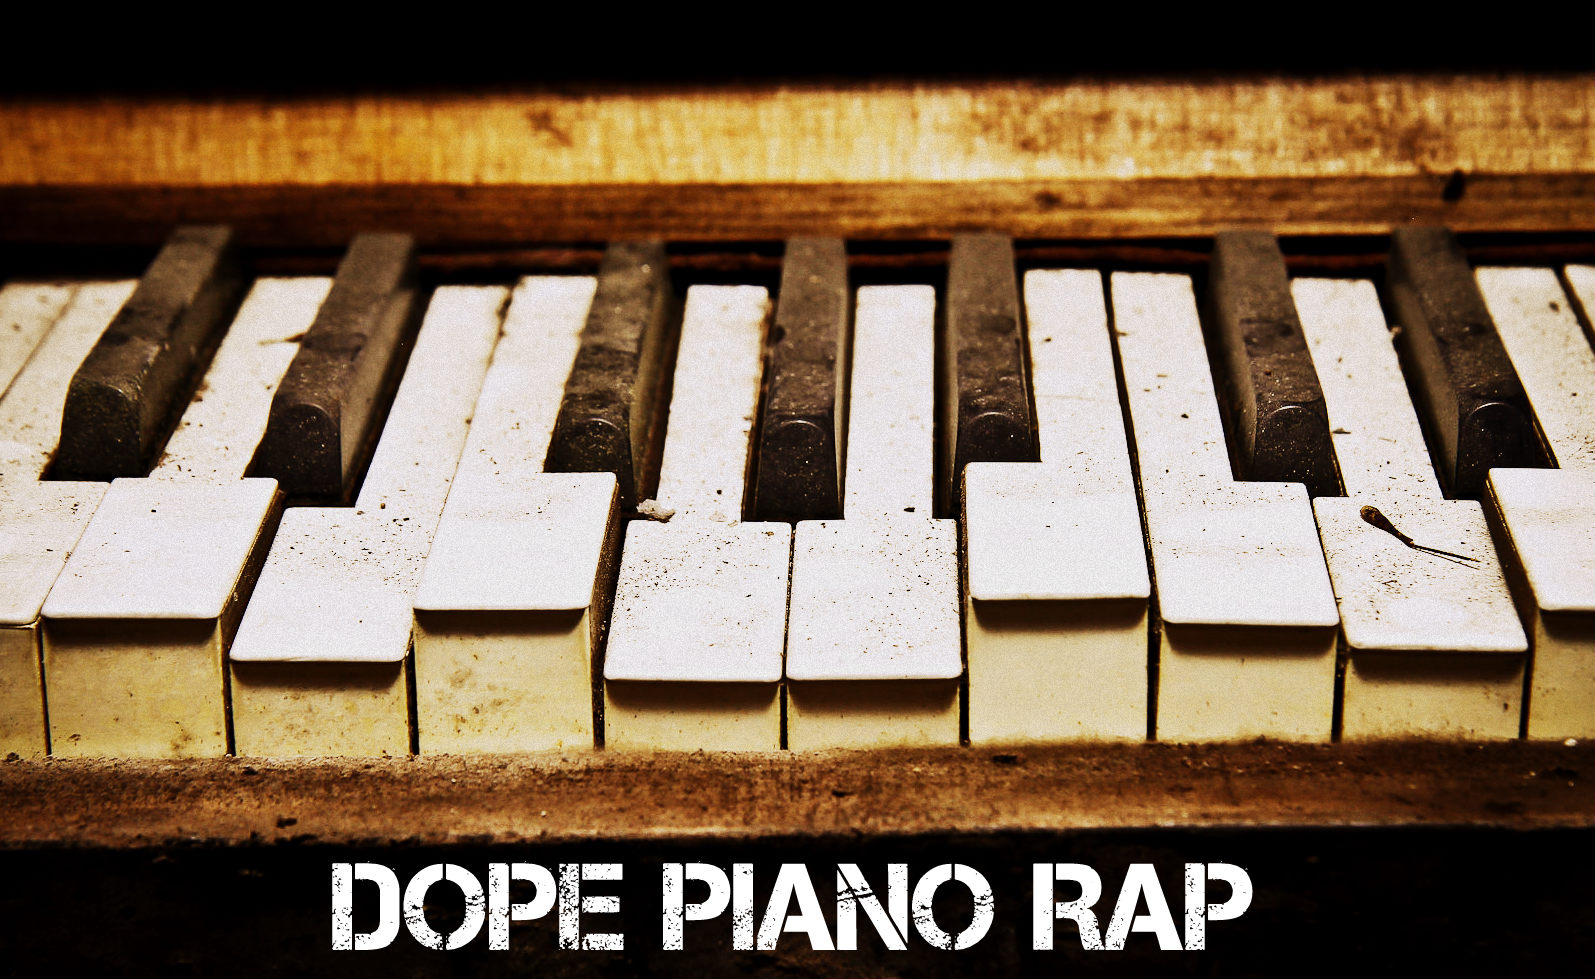 Poetic Rap Justice - 10